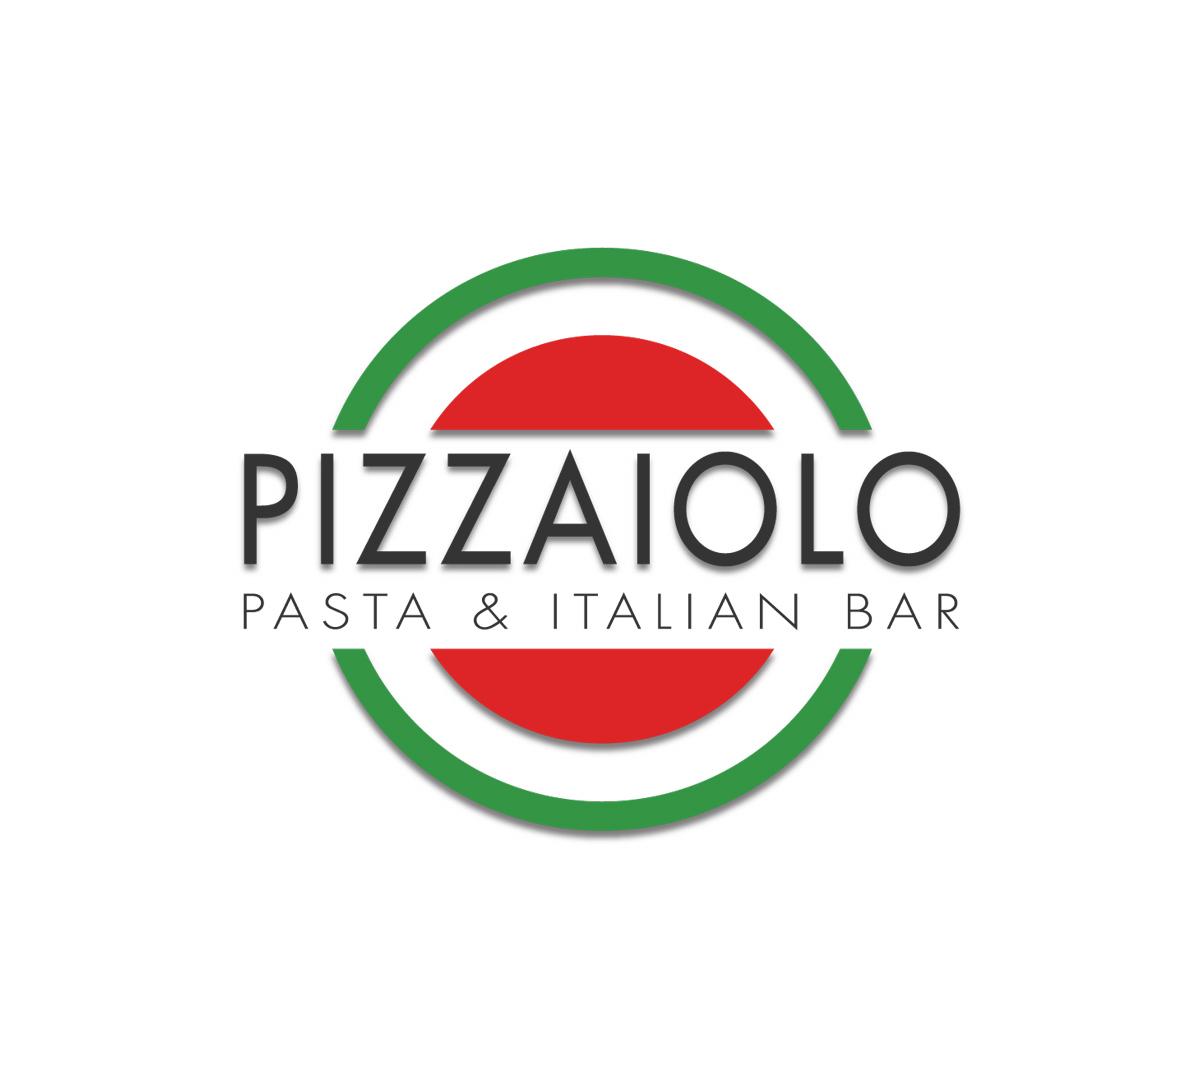 italian restaurant logos rh logolynx com italian restaurants logos with a flag italian restaurant logo game